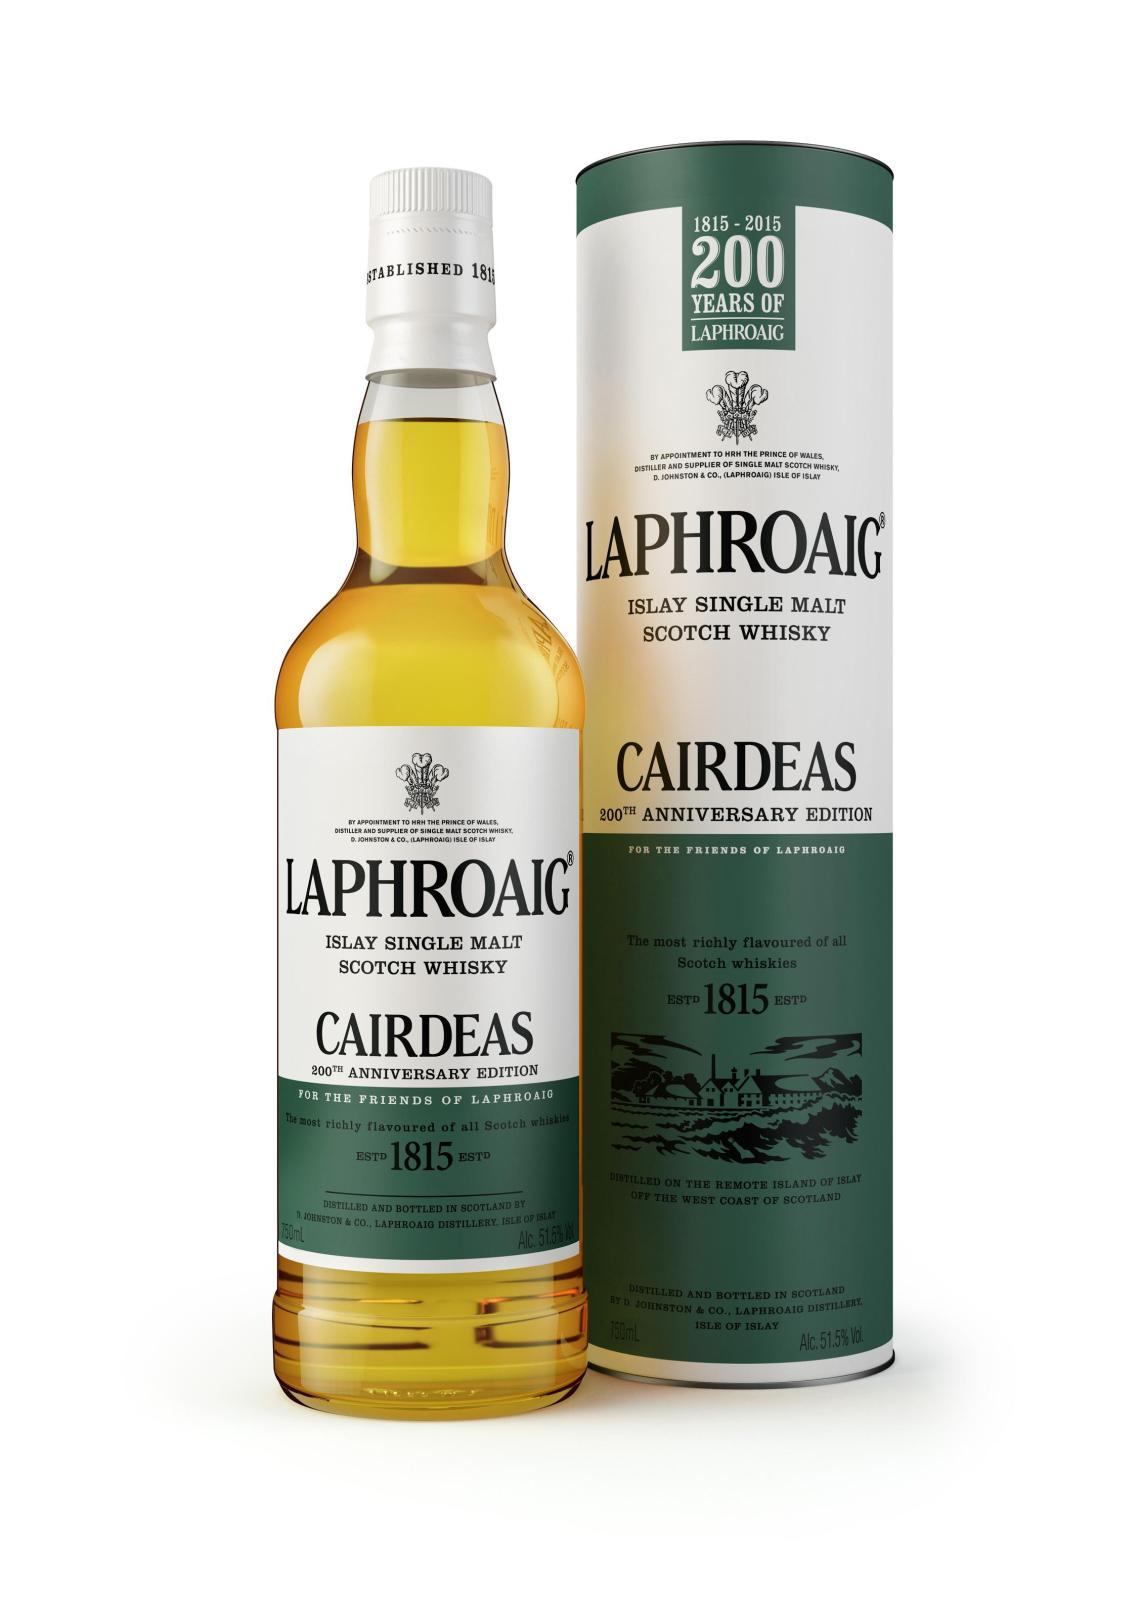 Laphroaig Cairdeas 200th Anniversary Edition 2015